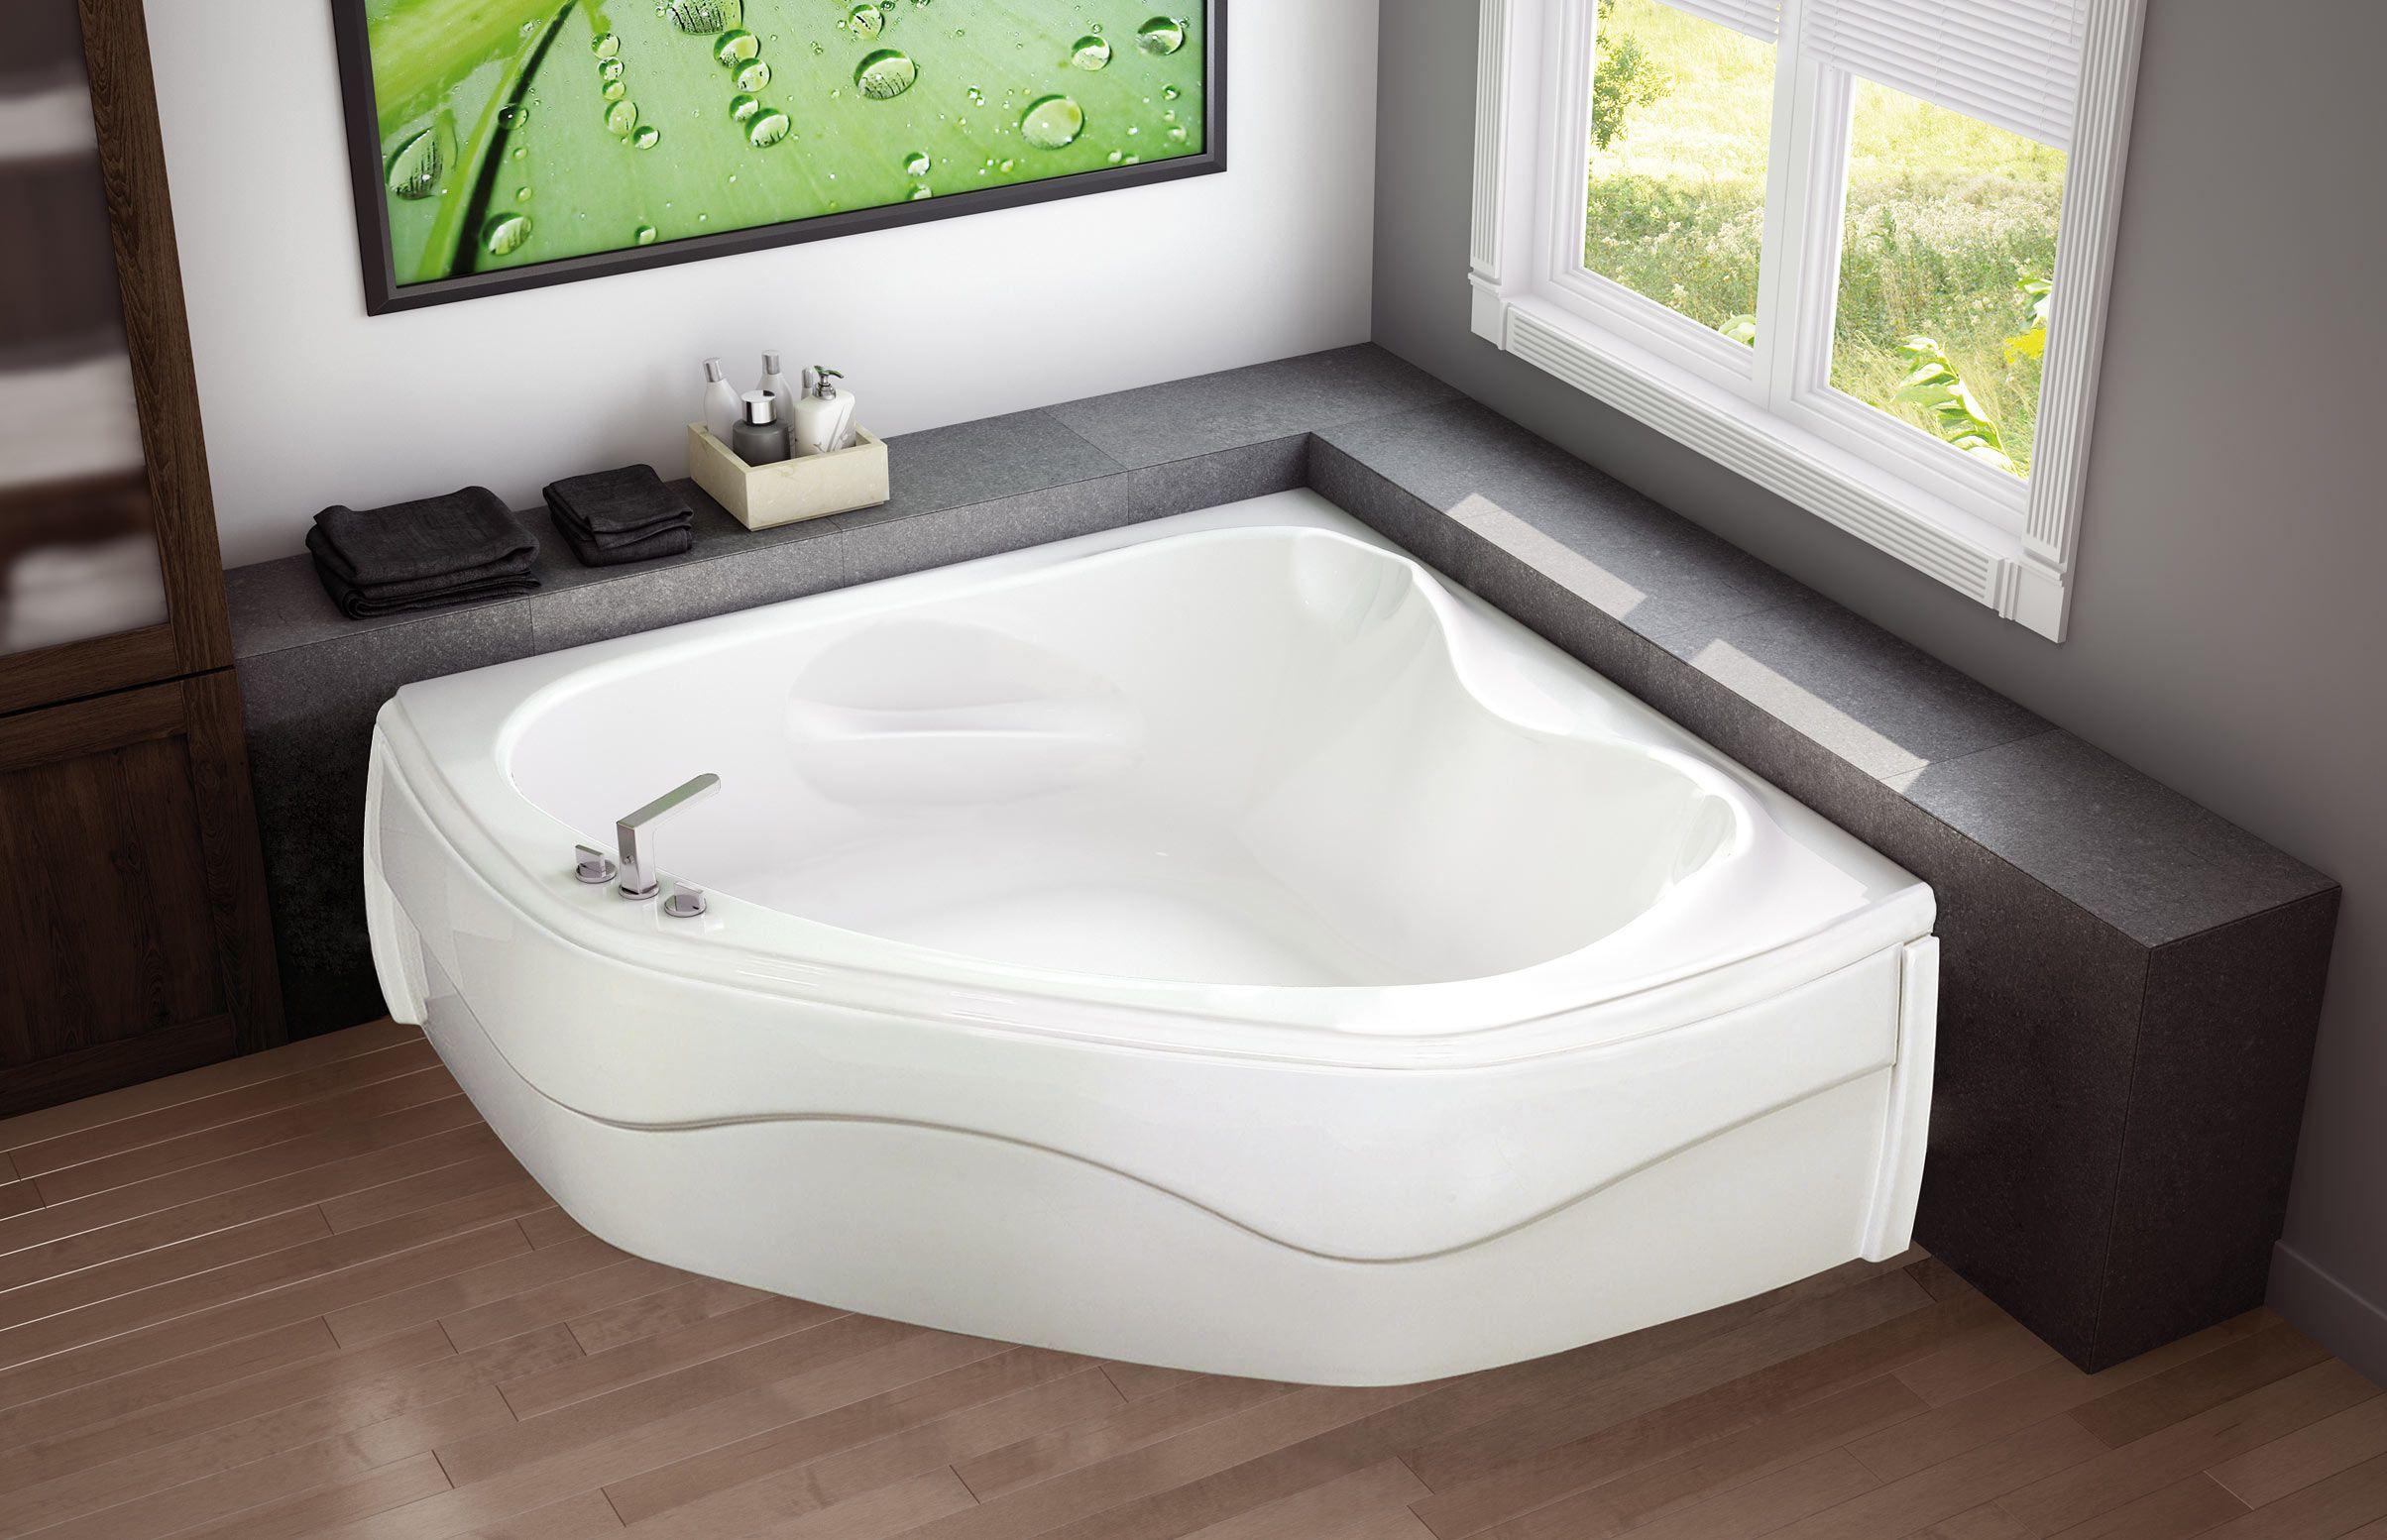 VICHY CORNER Corner or Drop-in bathtub - MAAX Collection | Master ...